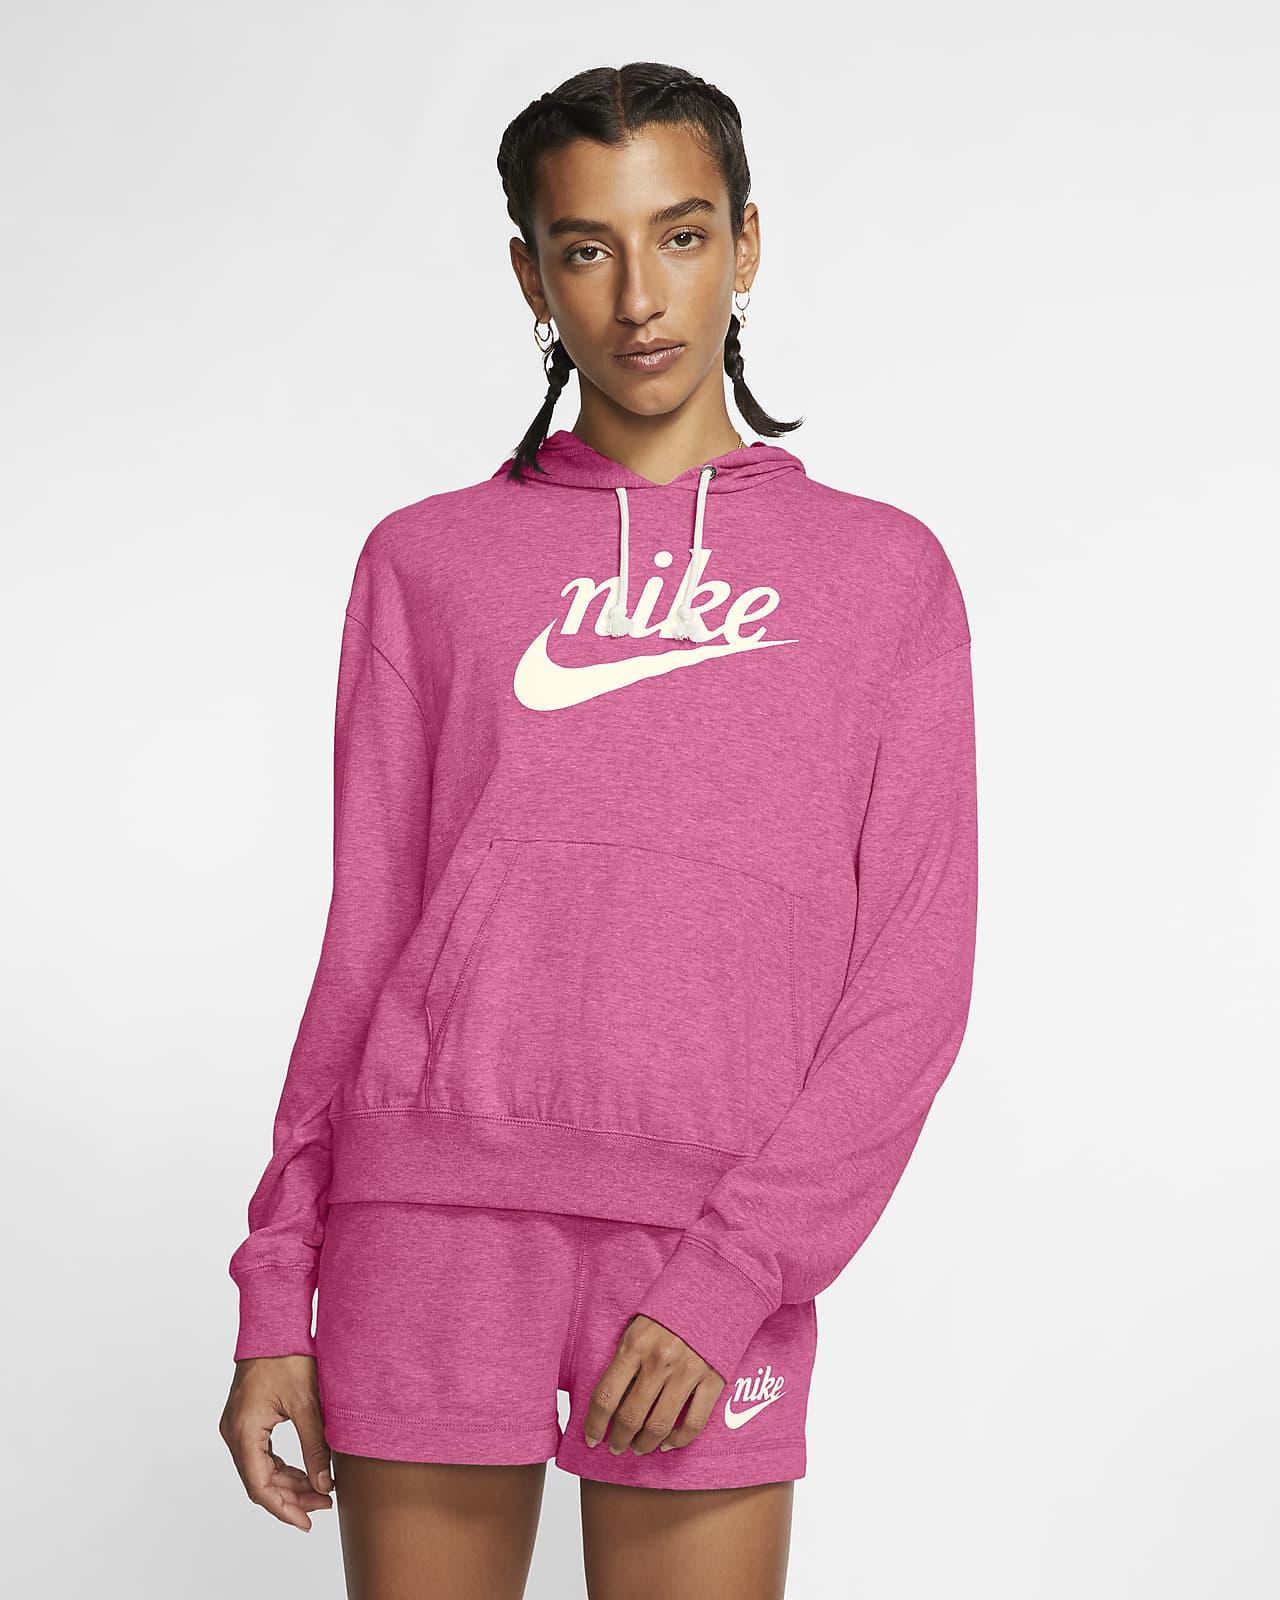 Tom Audreath Sopravvivere imposta  Felpa con cappuccio Nike Sportswear Gym Vintage - Donna. Nike IT